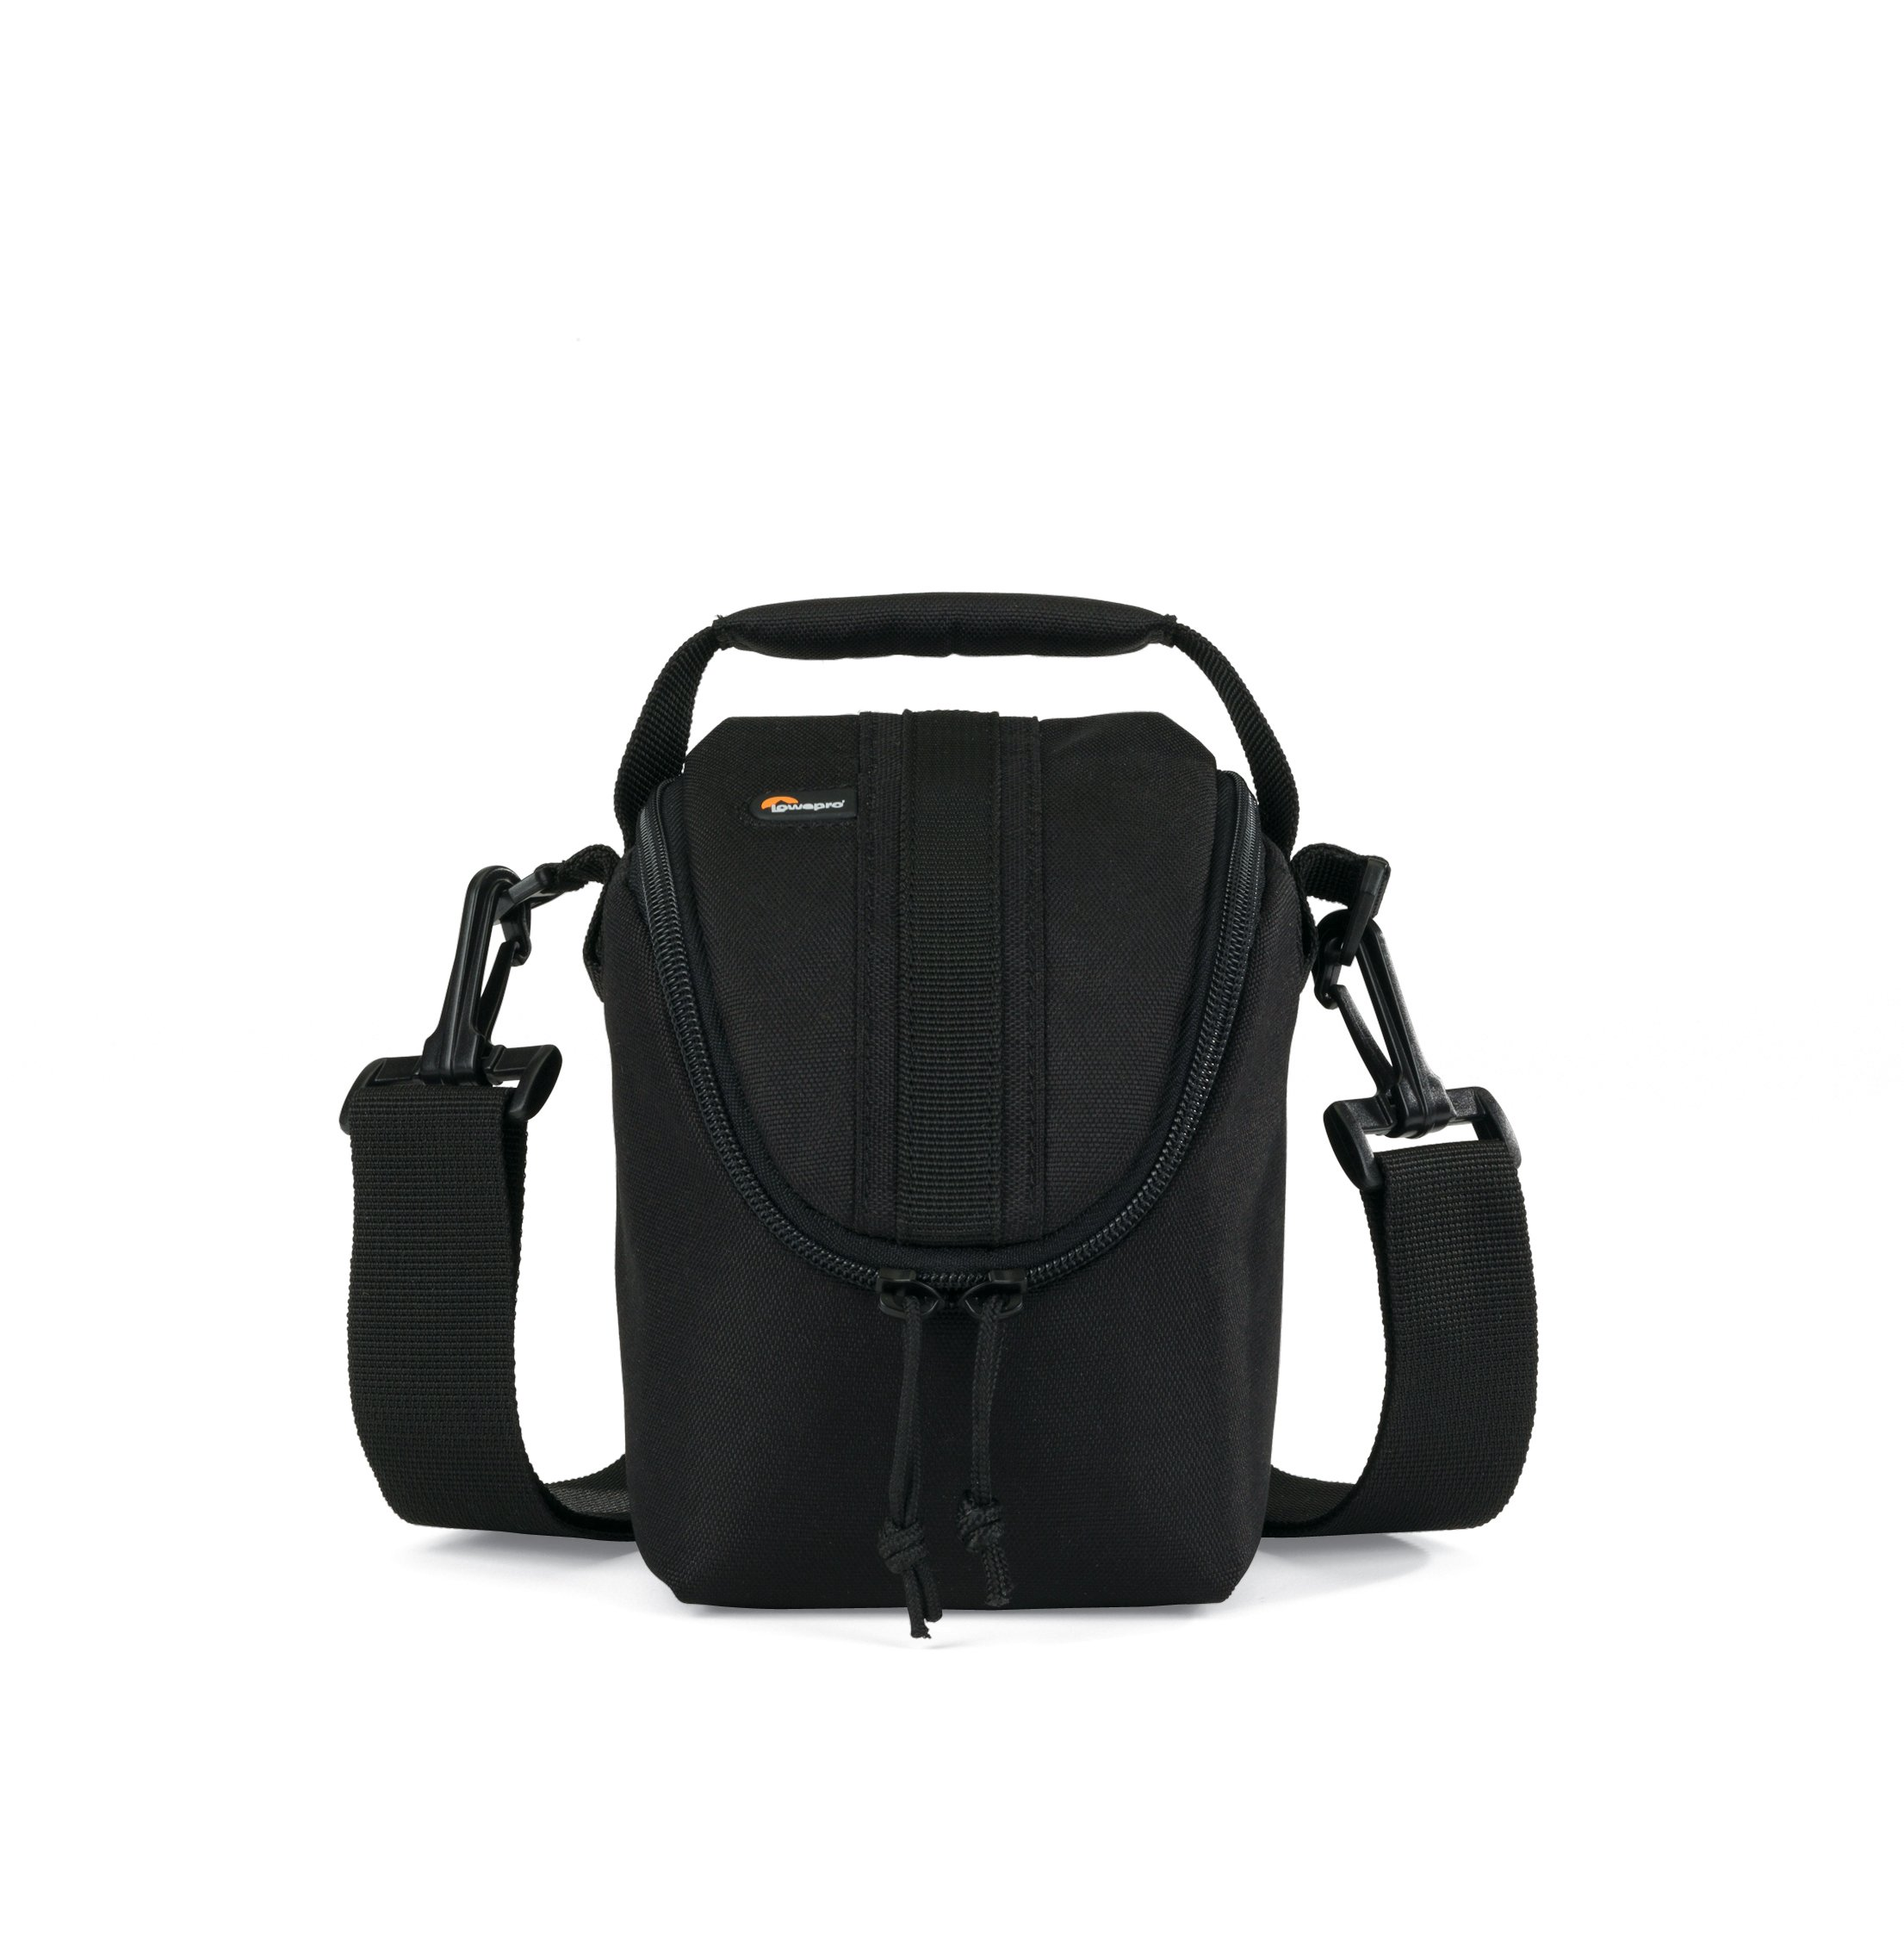 Lowepro Adventura Ultra Zoom 100 Camera Shoulder Bag for Mirrorless and Ultra-Zoom Cameras